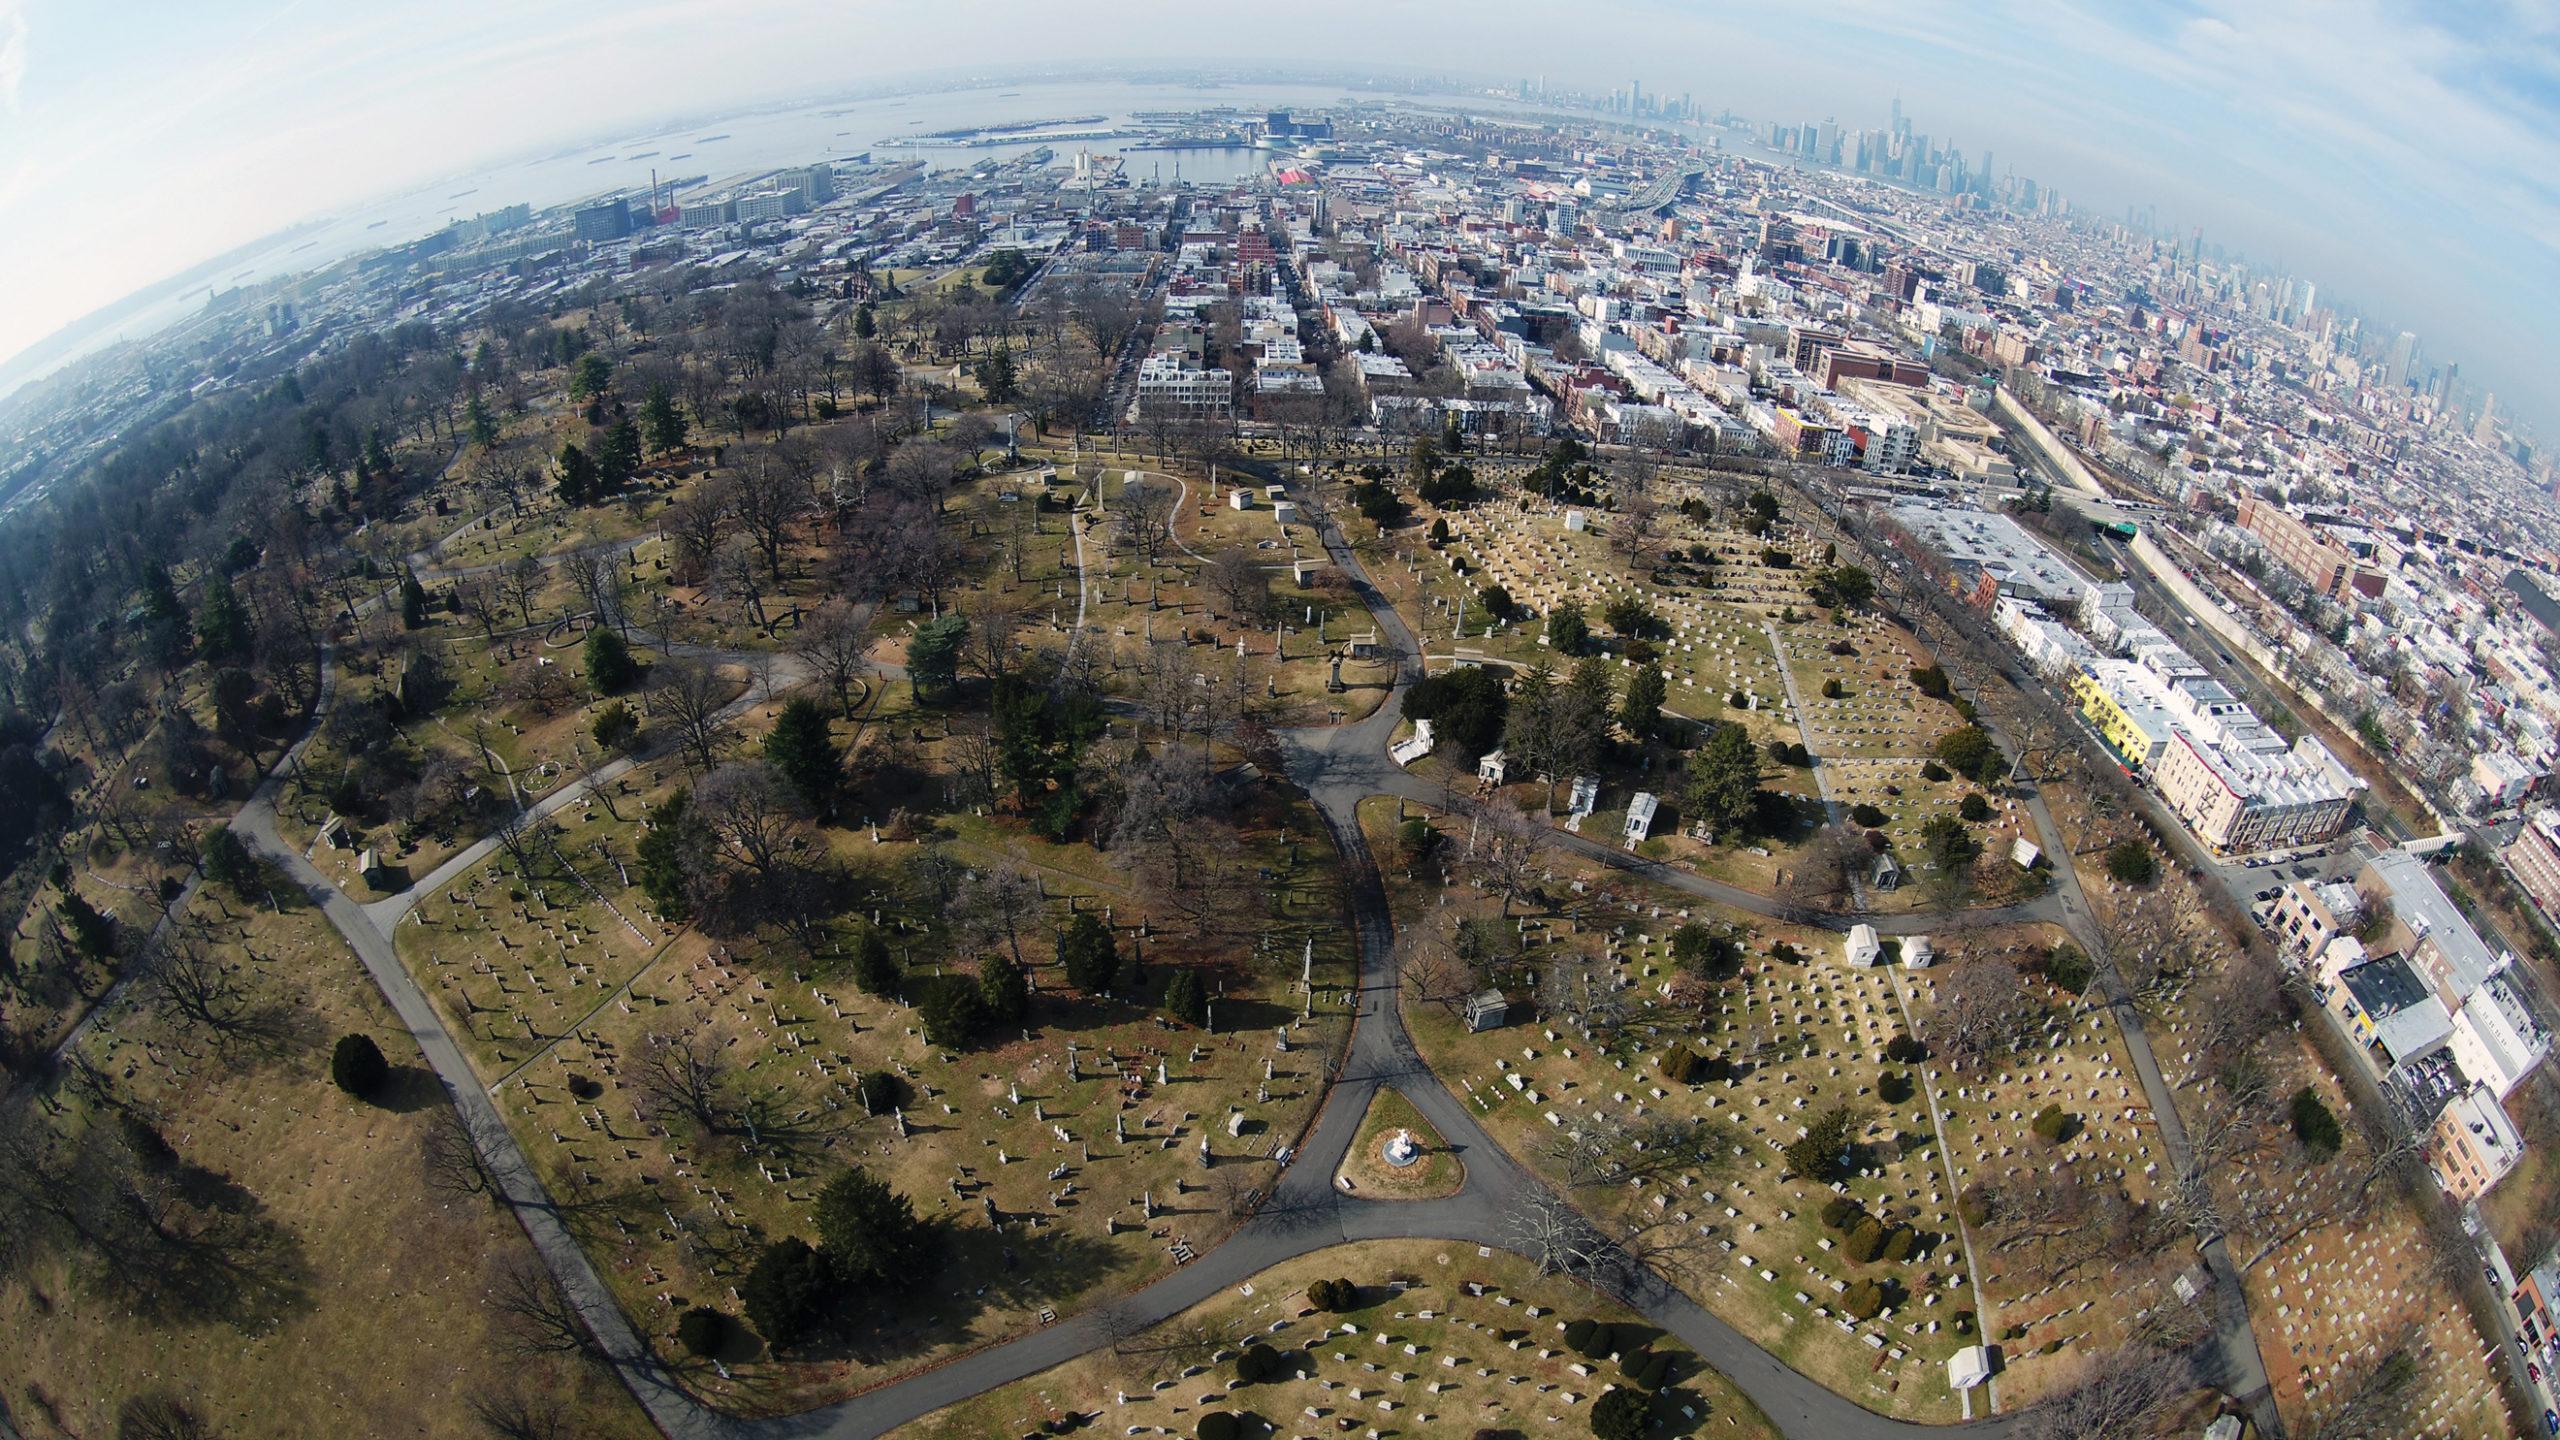 Aerial photograph of cemetery with Manhattan skyline on horizon